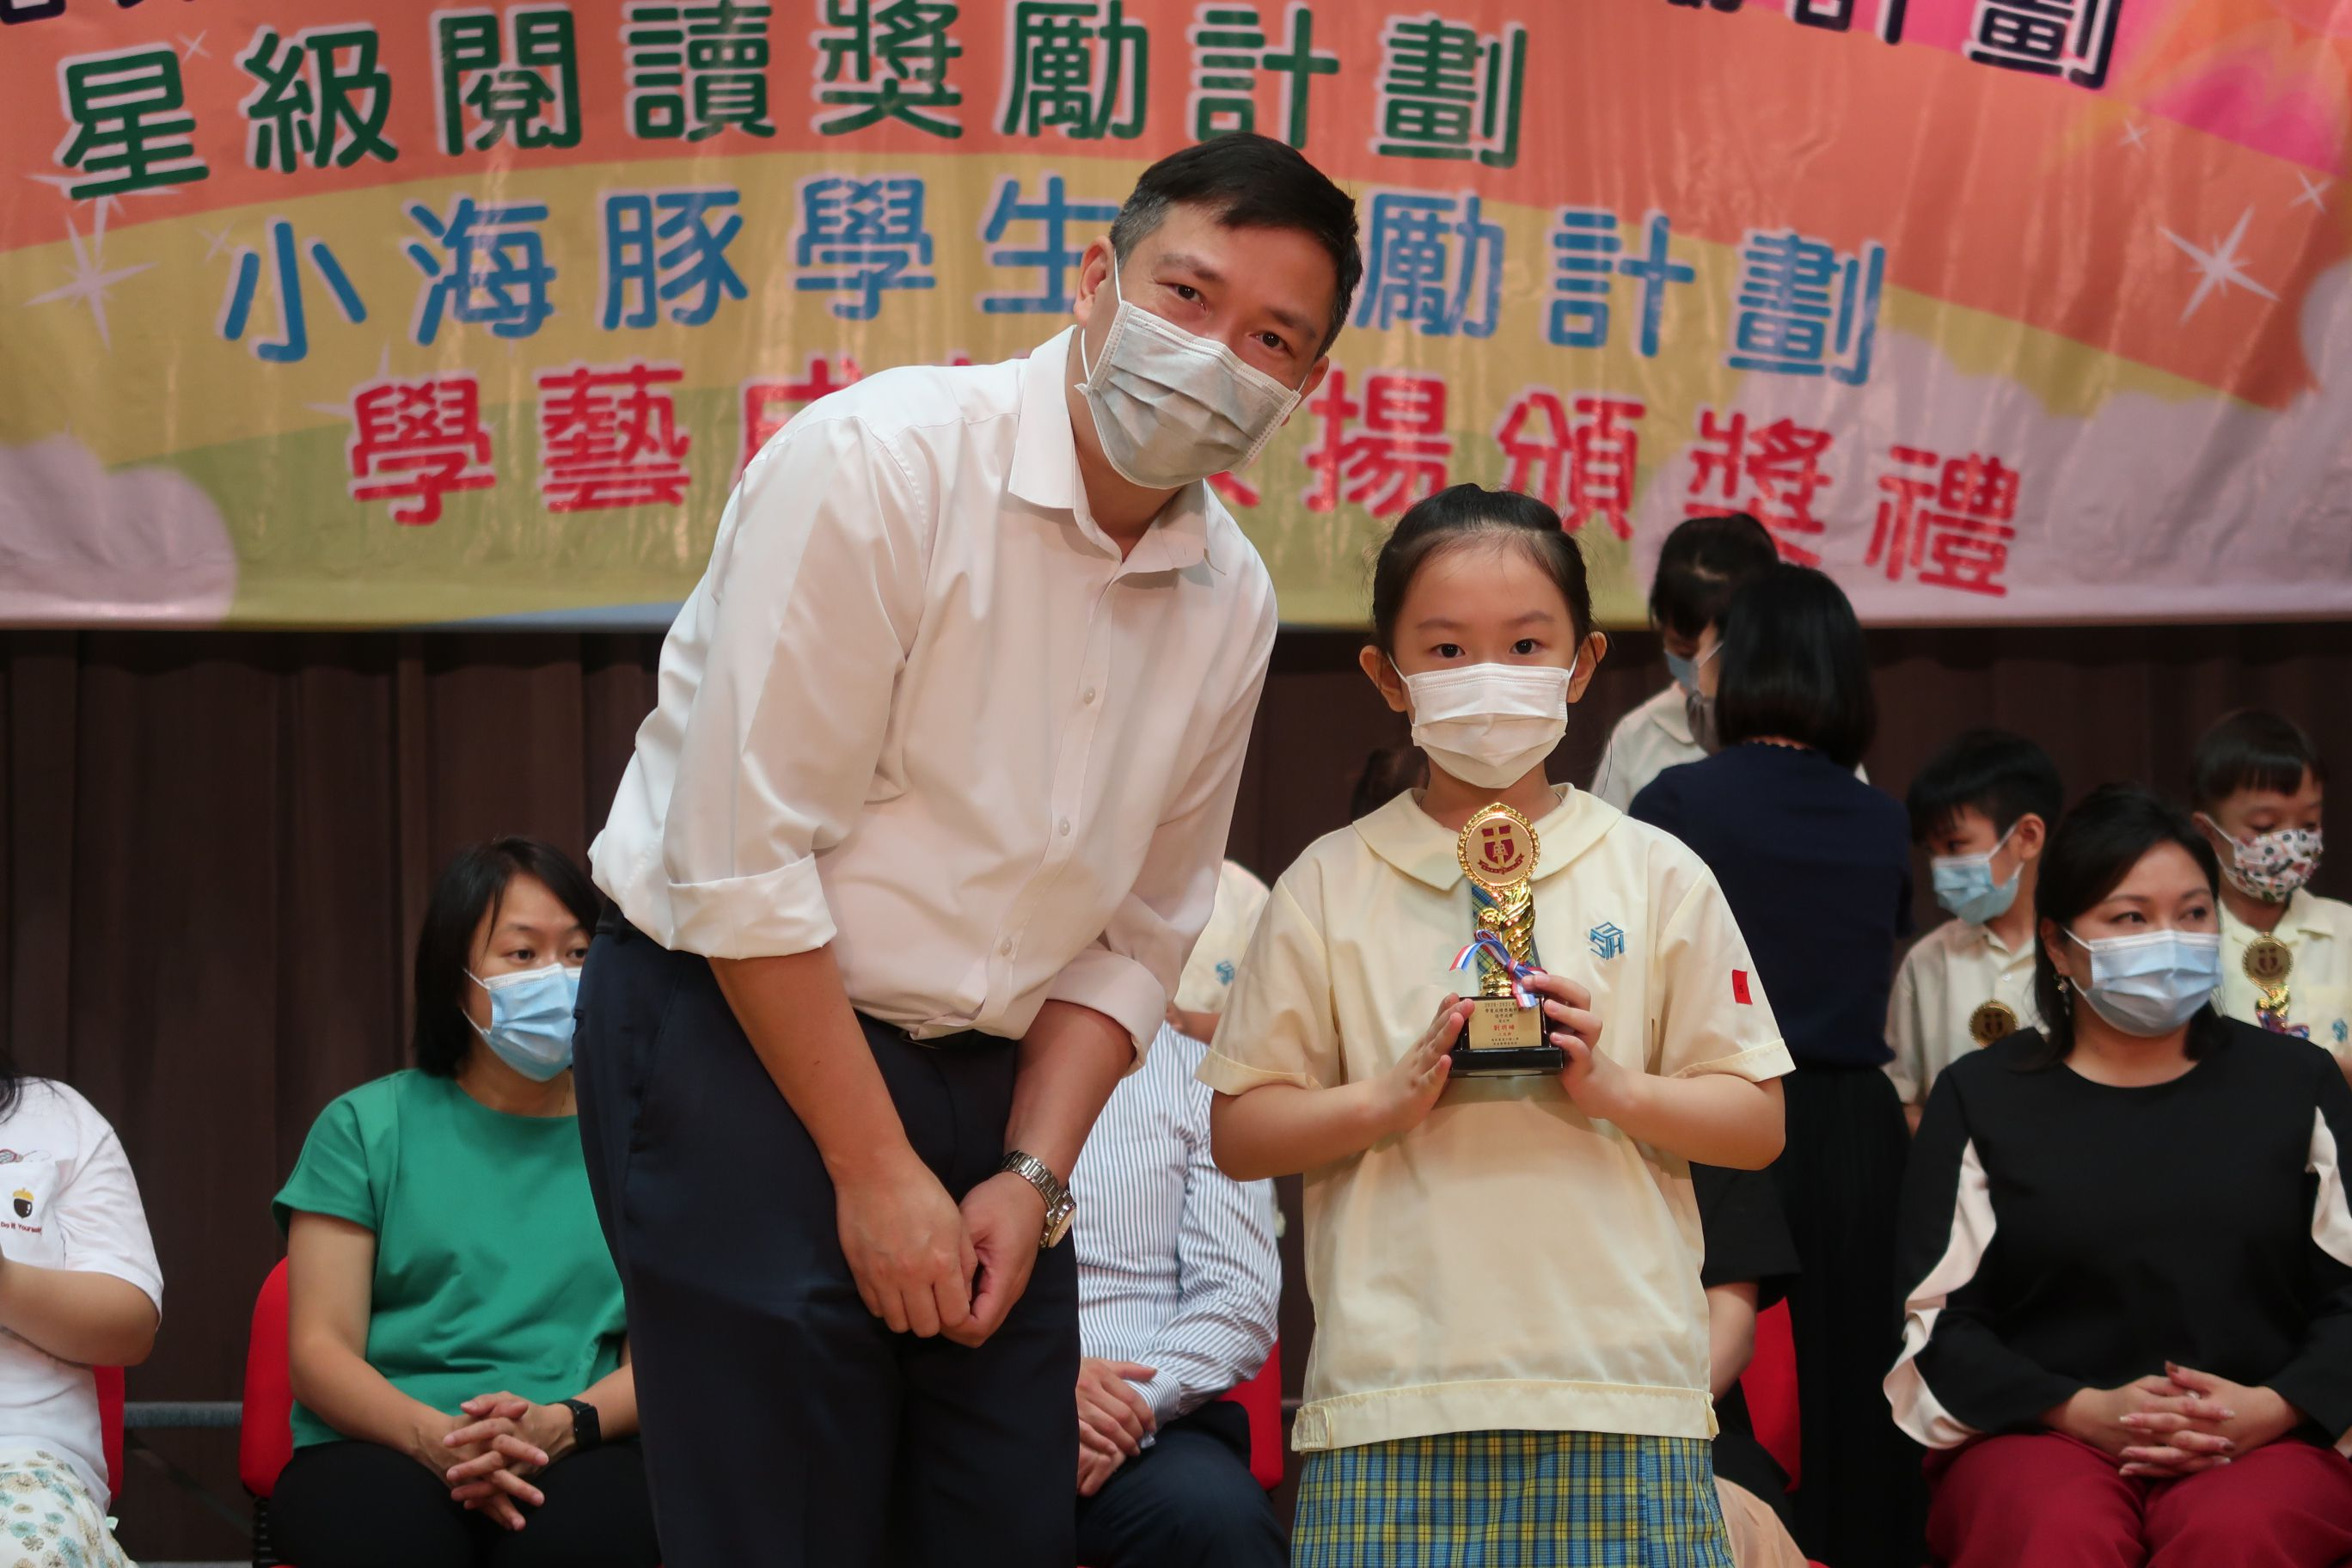 https://syh.edu.hk/sites/default/files/img_5657.jpg